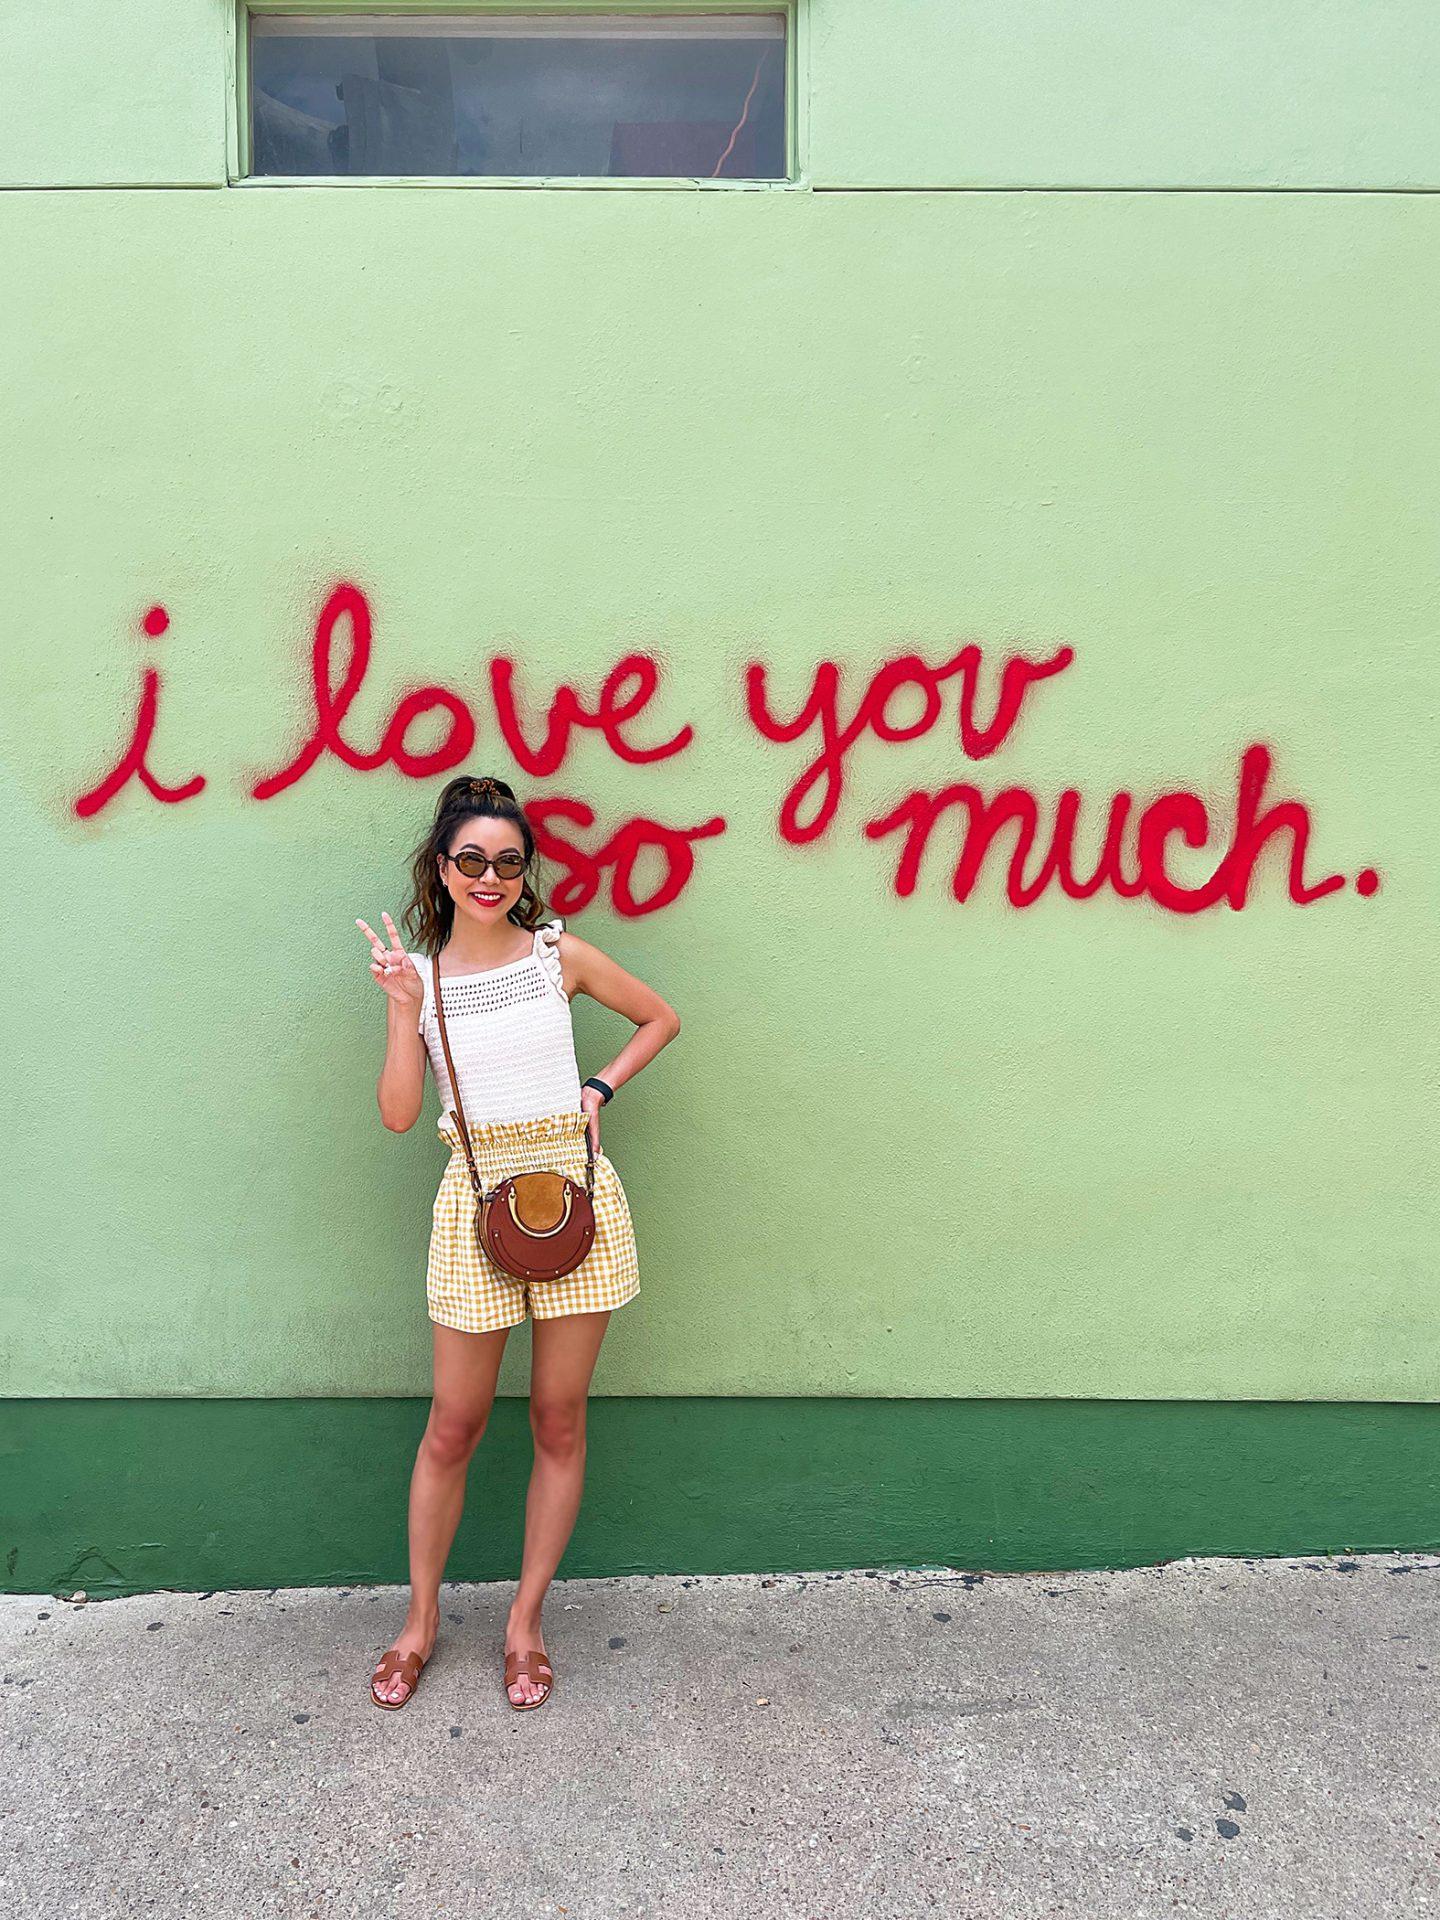 Austin Texas Jo's Coffee I Love You So Much art wall